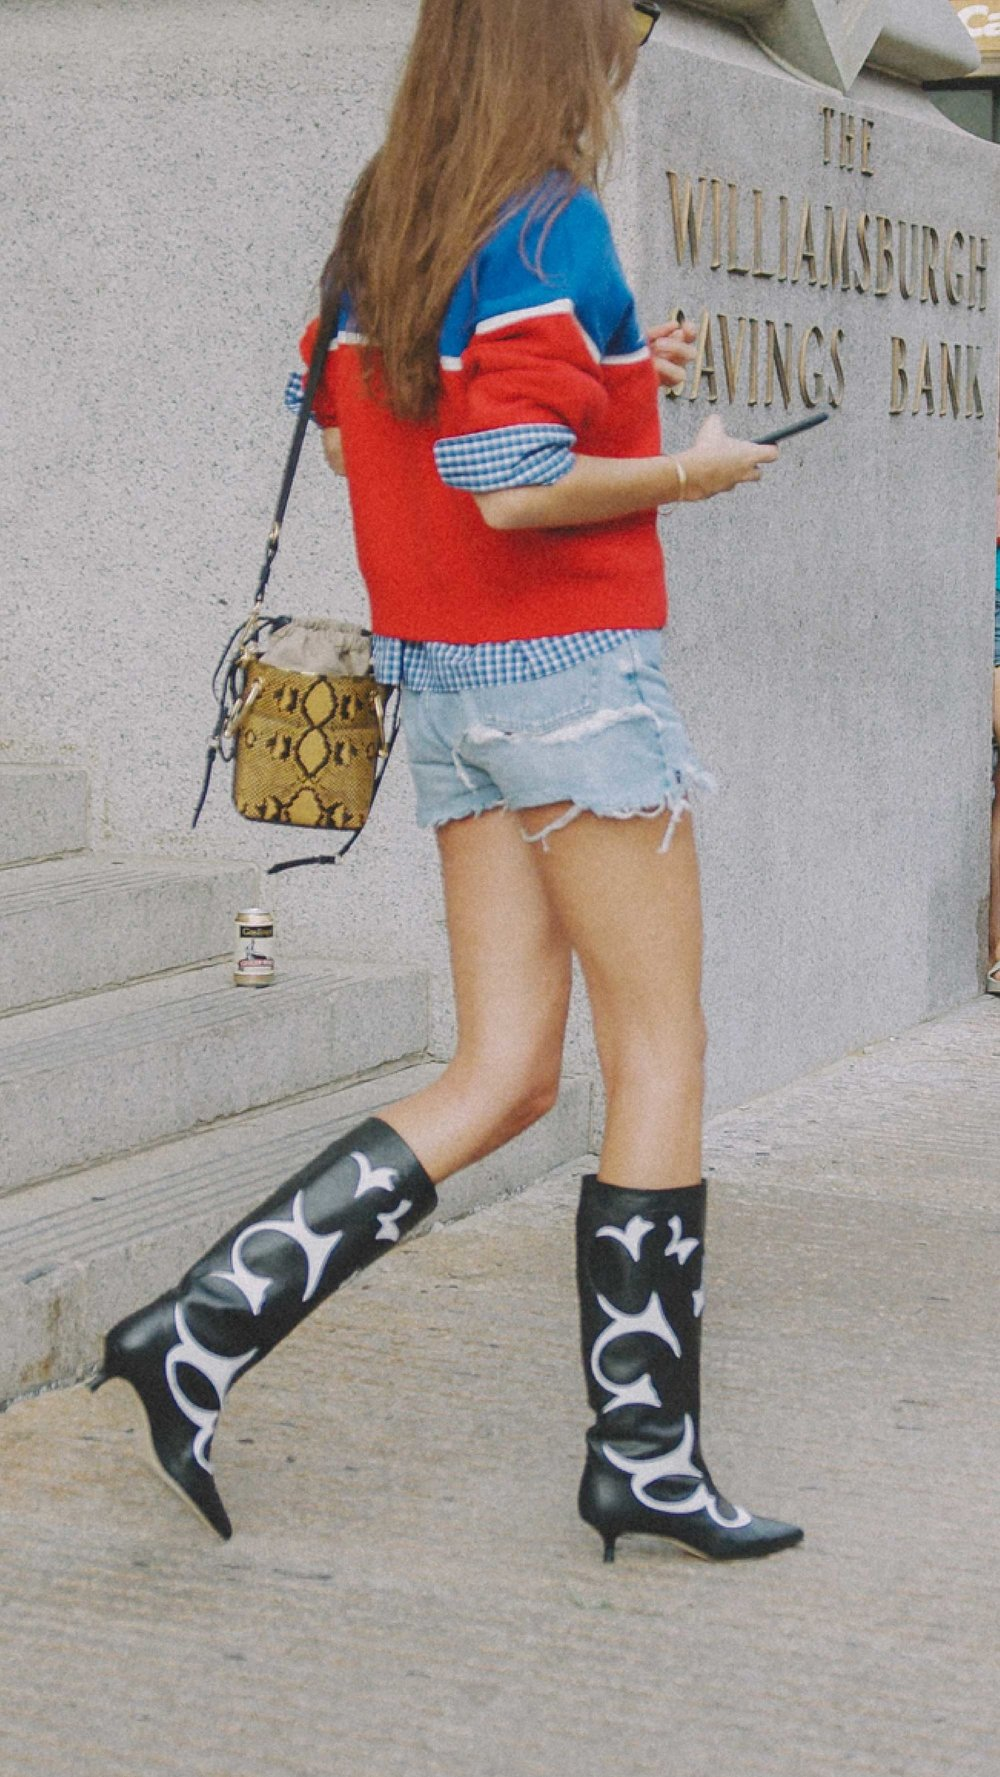 12 Best Chloe bags of Fashion Week -  CHLOe Roy mini leather bucket bag and Chloe Small Tess Leather Shoulder Bag8.jpg